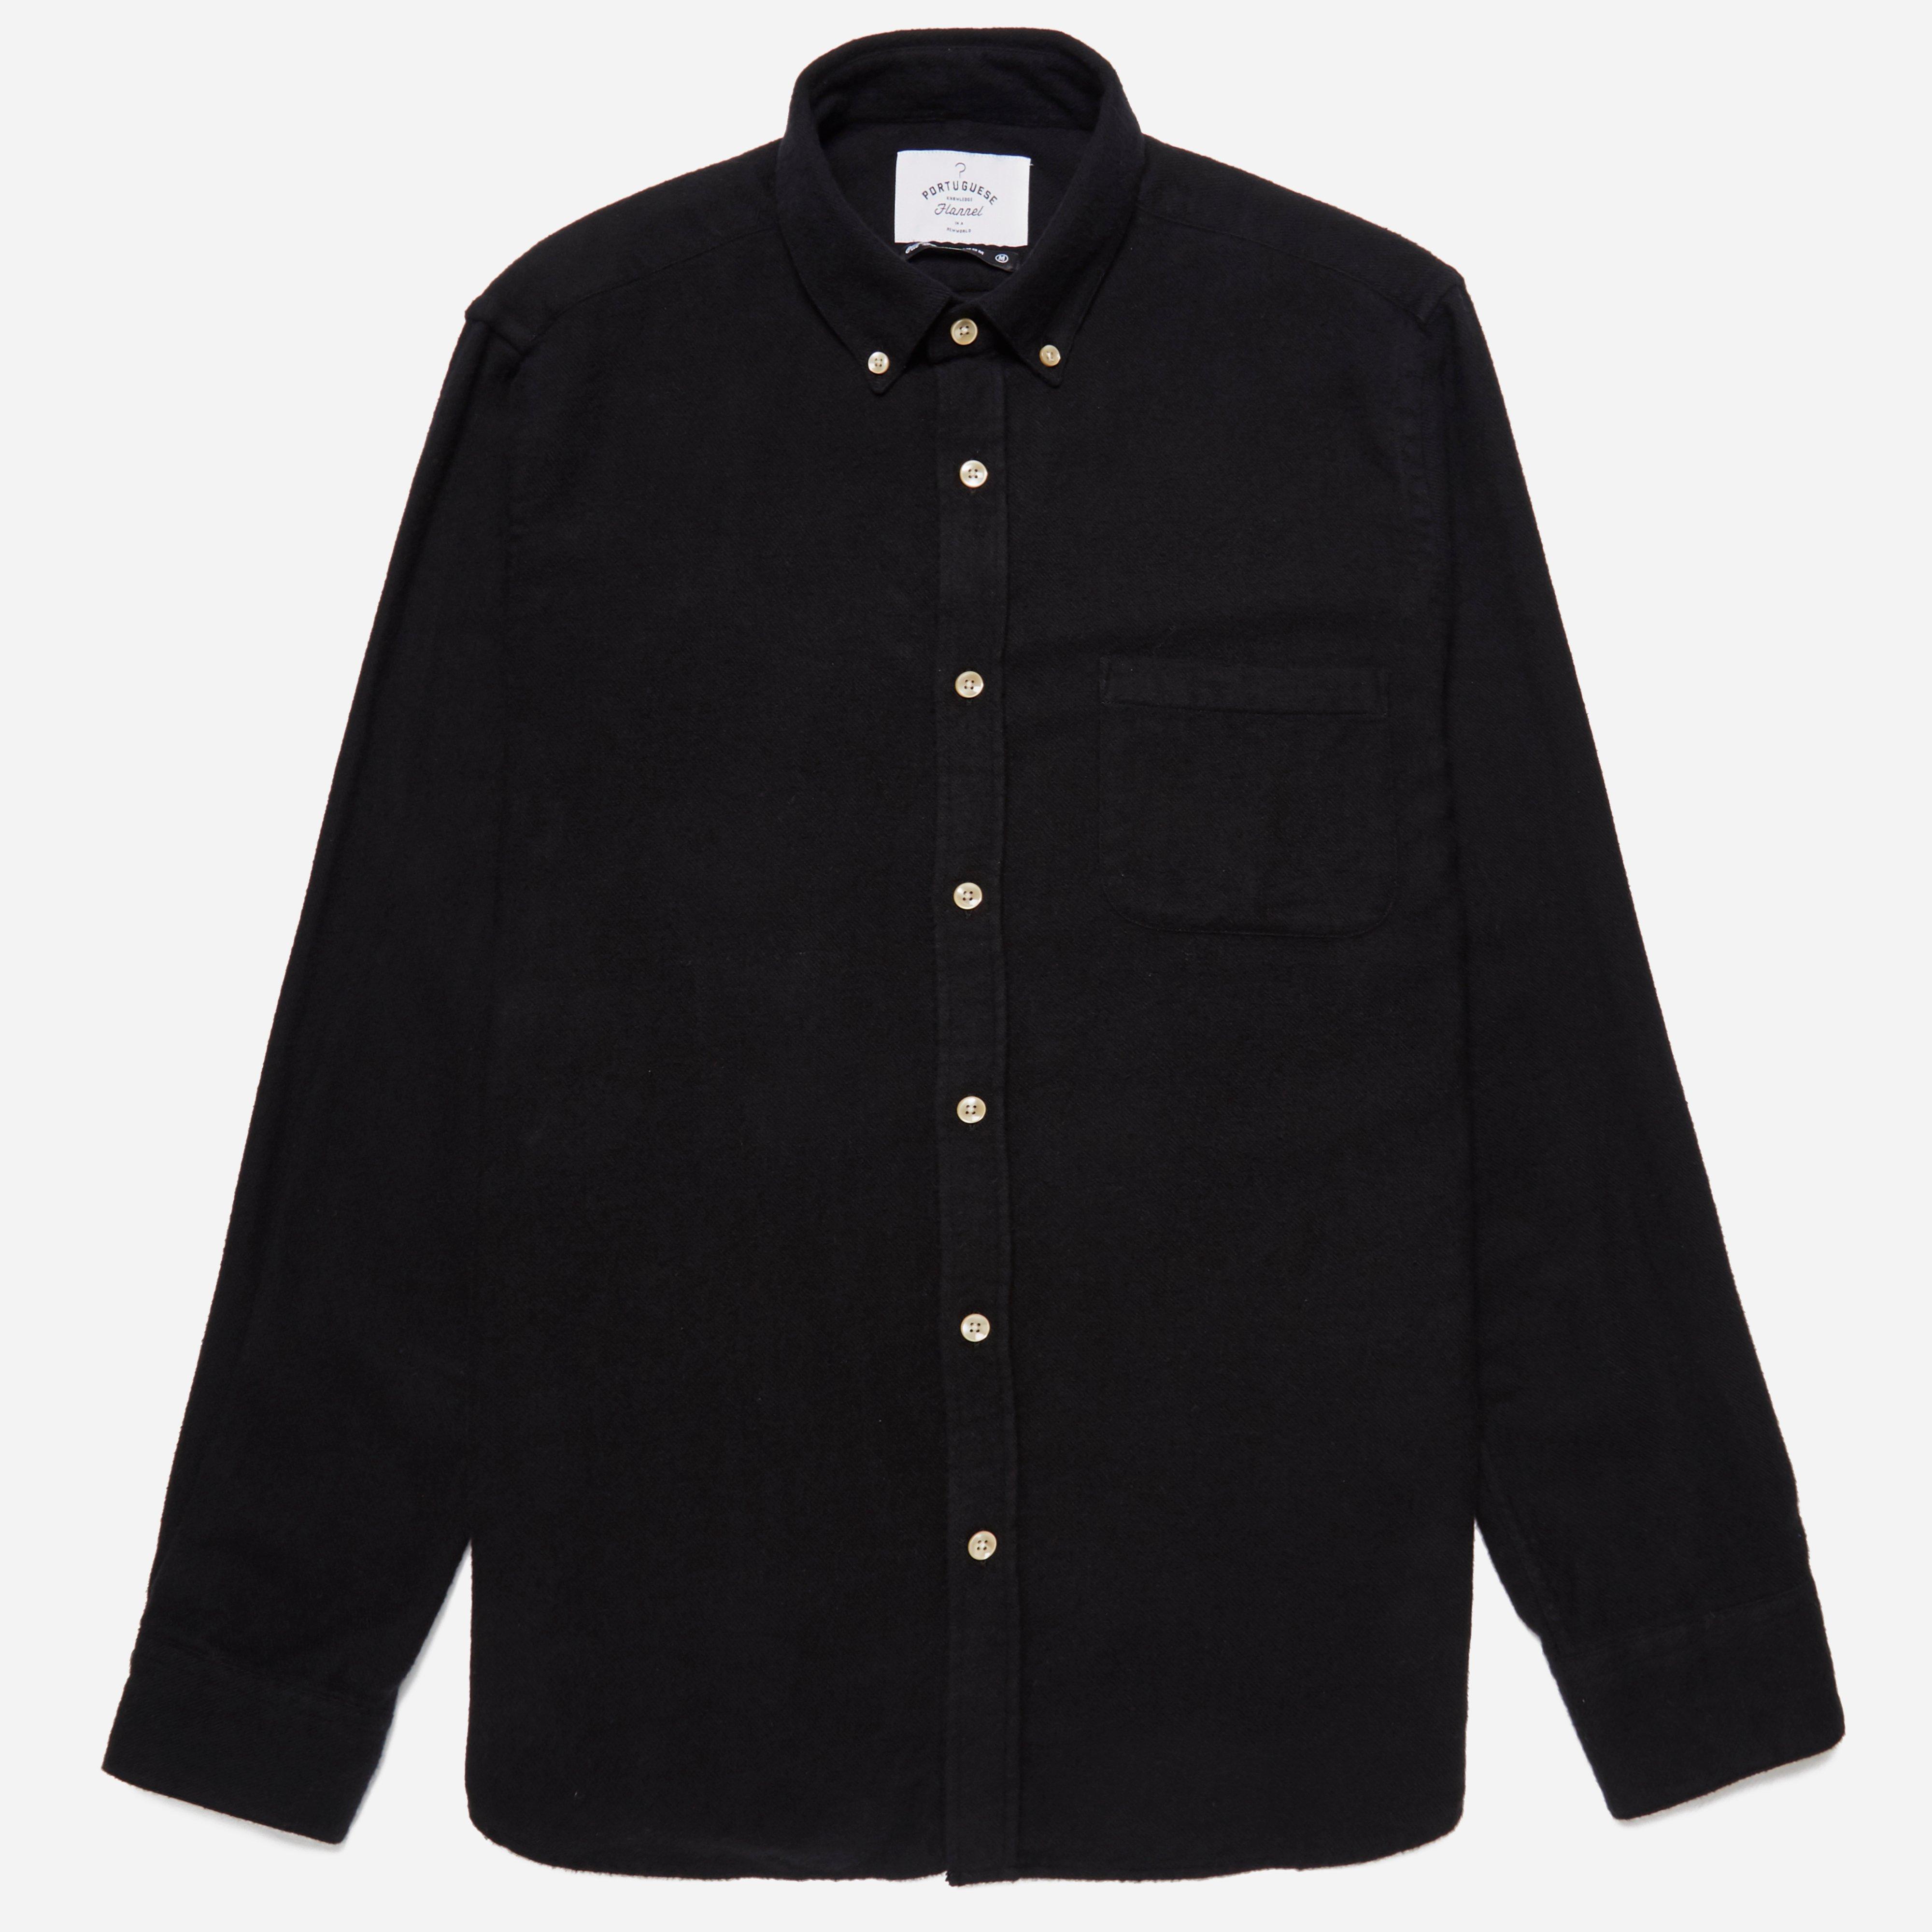 Portuguese Flannel Flannel Button Down Shirt